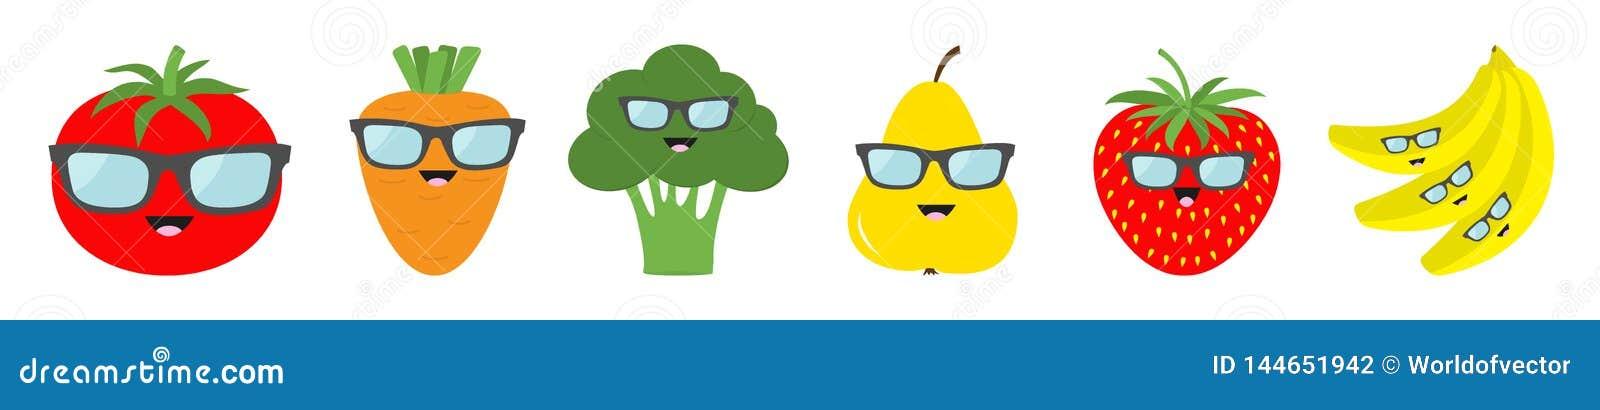 Fruit berry vegetable face sunglasses icon set line. Pear strawberry banana,Tomato, carrot broccoli. Cute cartoon kawaii character